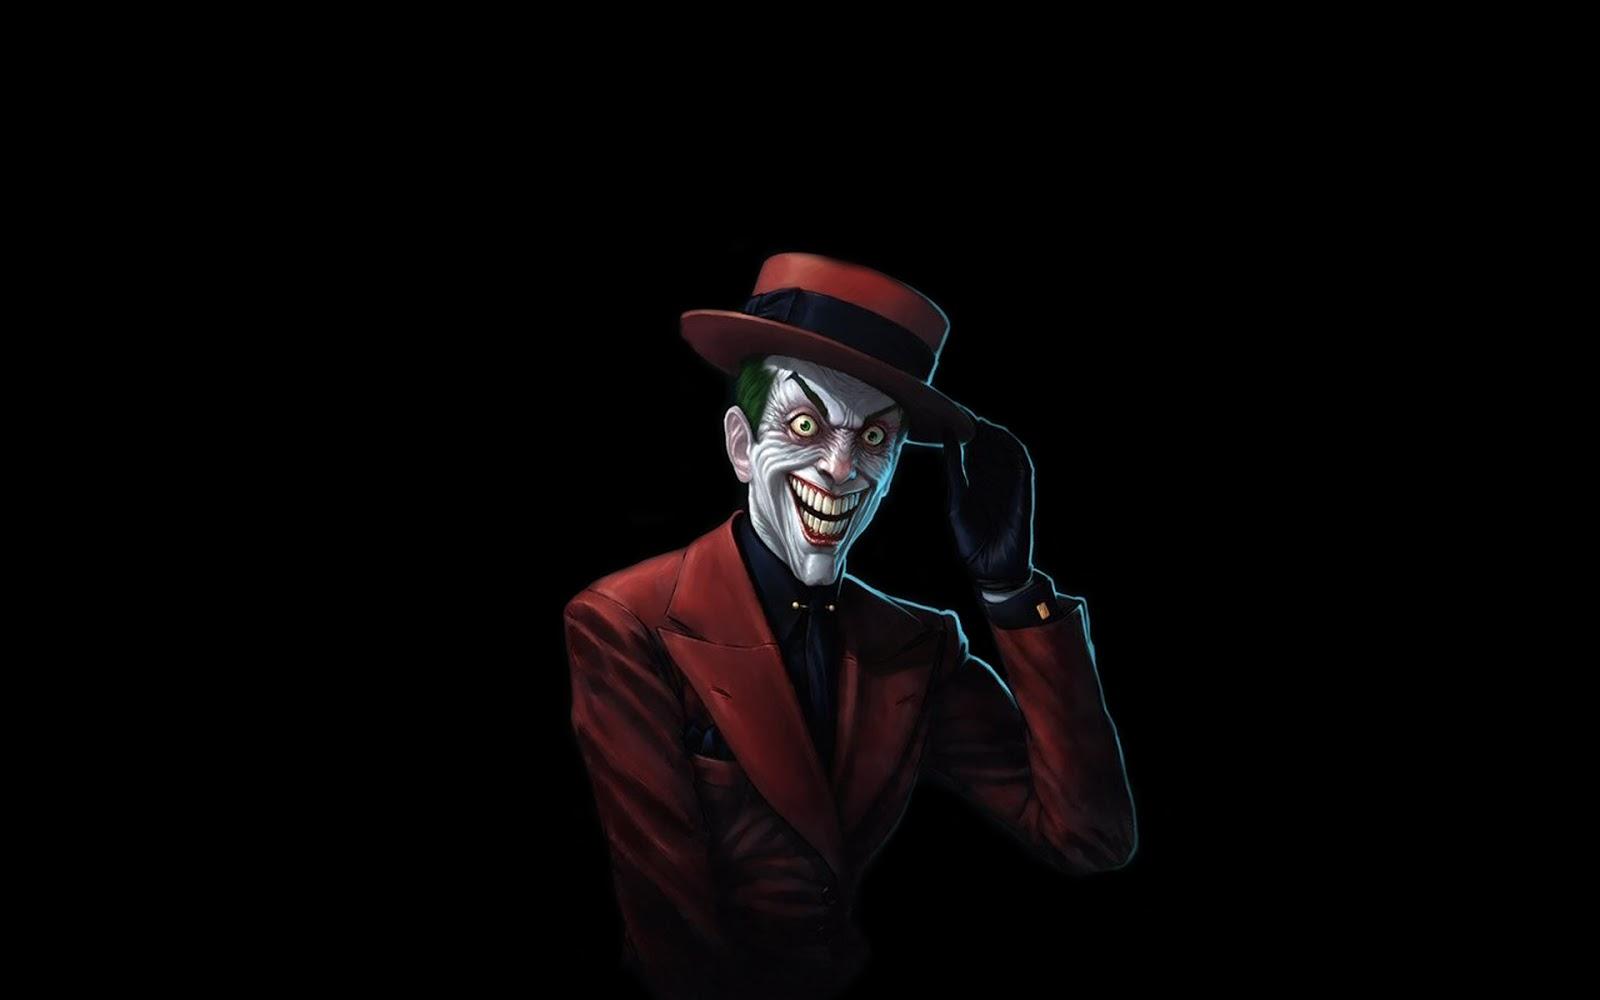 http://2.bp.blogspot.com/-txjR8im3oQI/UPhMcEUddvI/AAAAAAAAz1c/qjggqNiLy70/s1600/Joker-El-Guason-Batman_Fondos-de-Pantalla-de-Batman.jpg